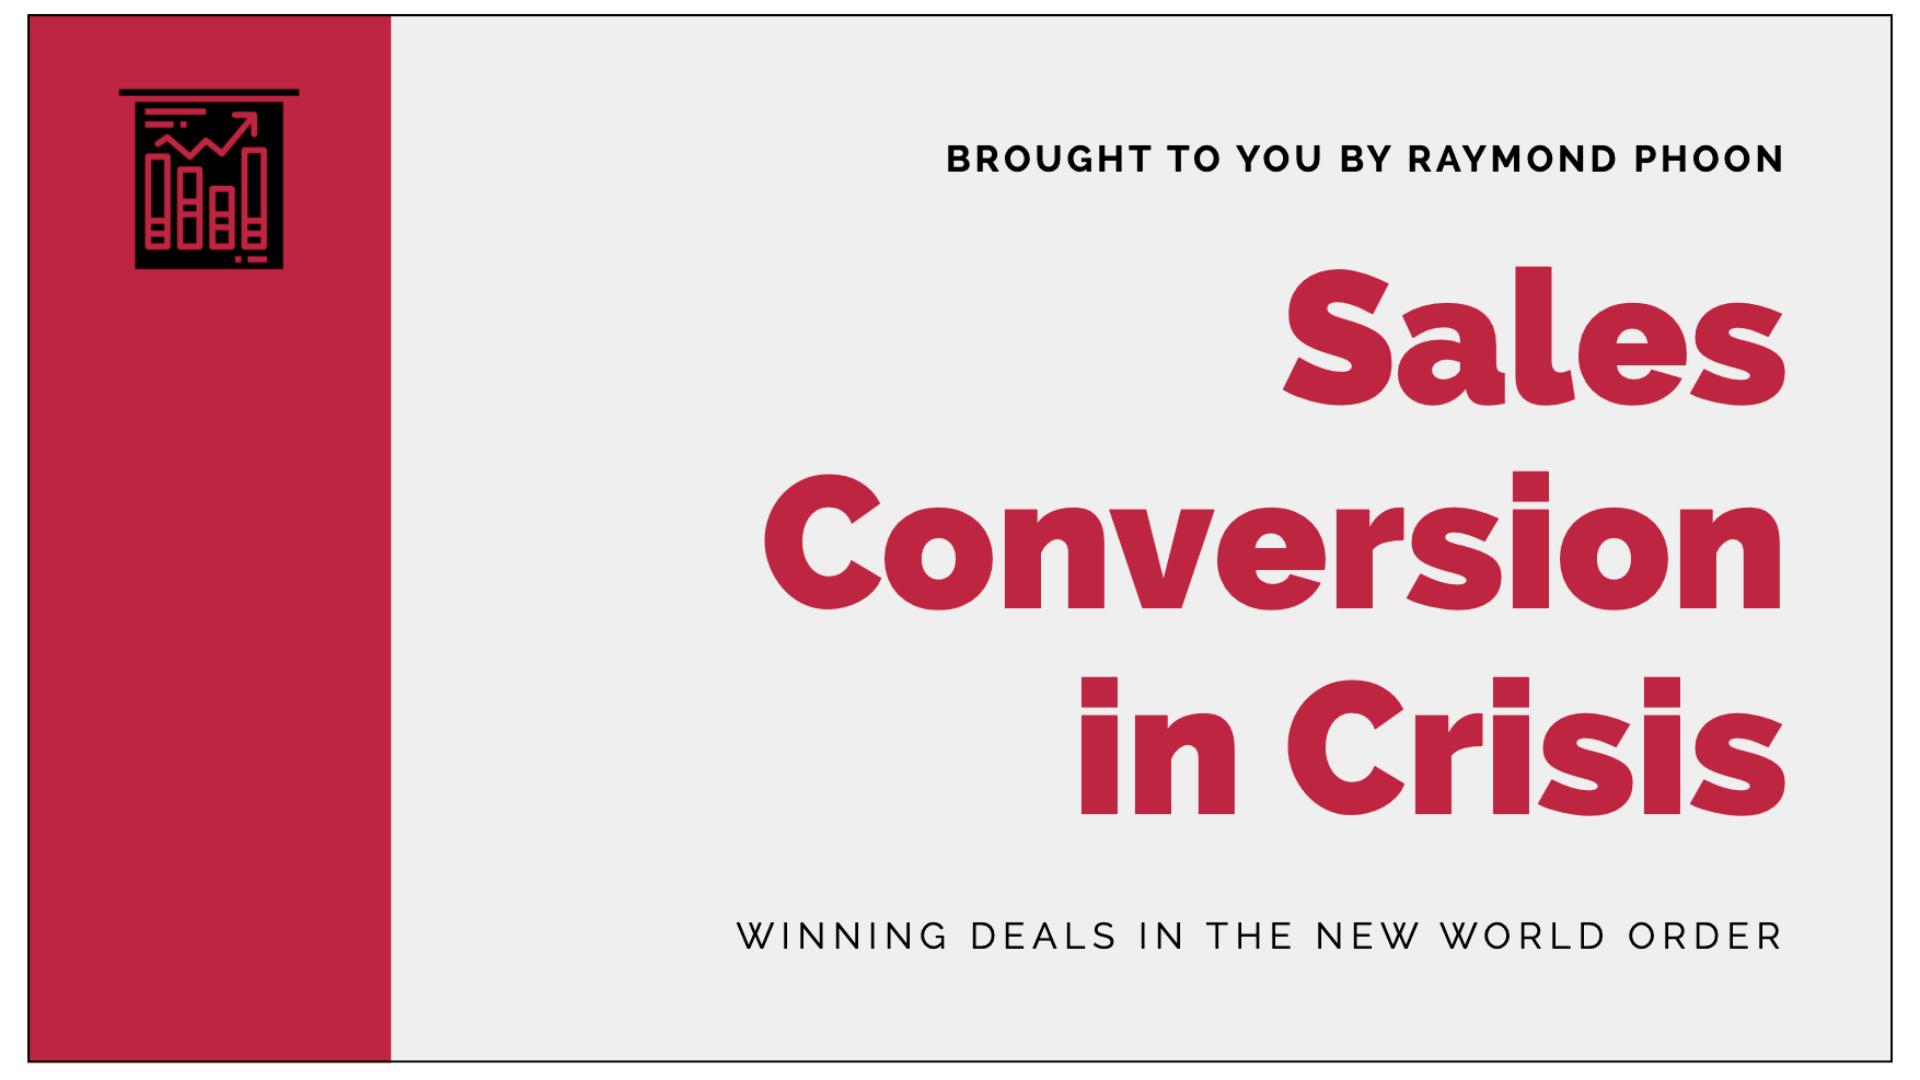 Sales Conversion in Crisis Download